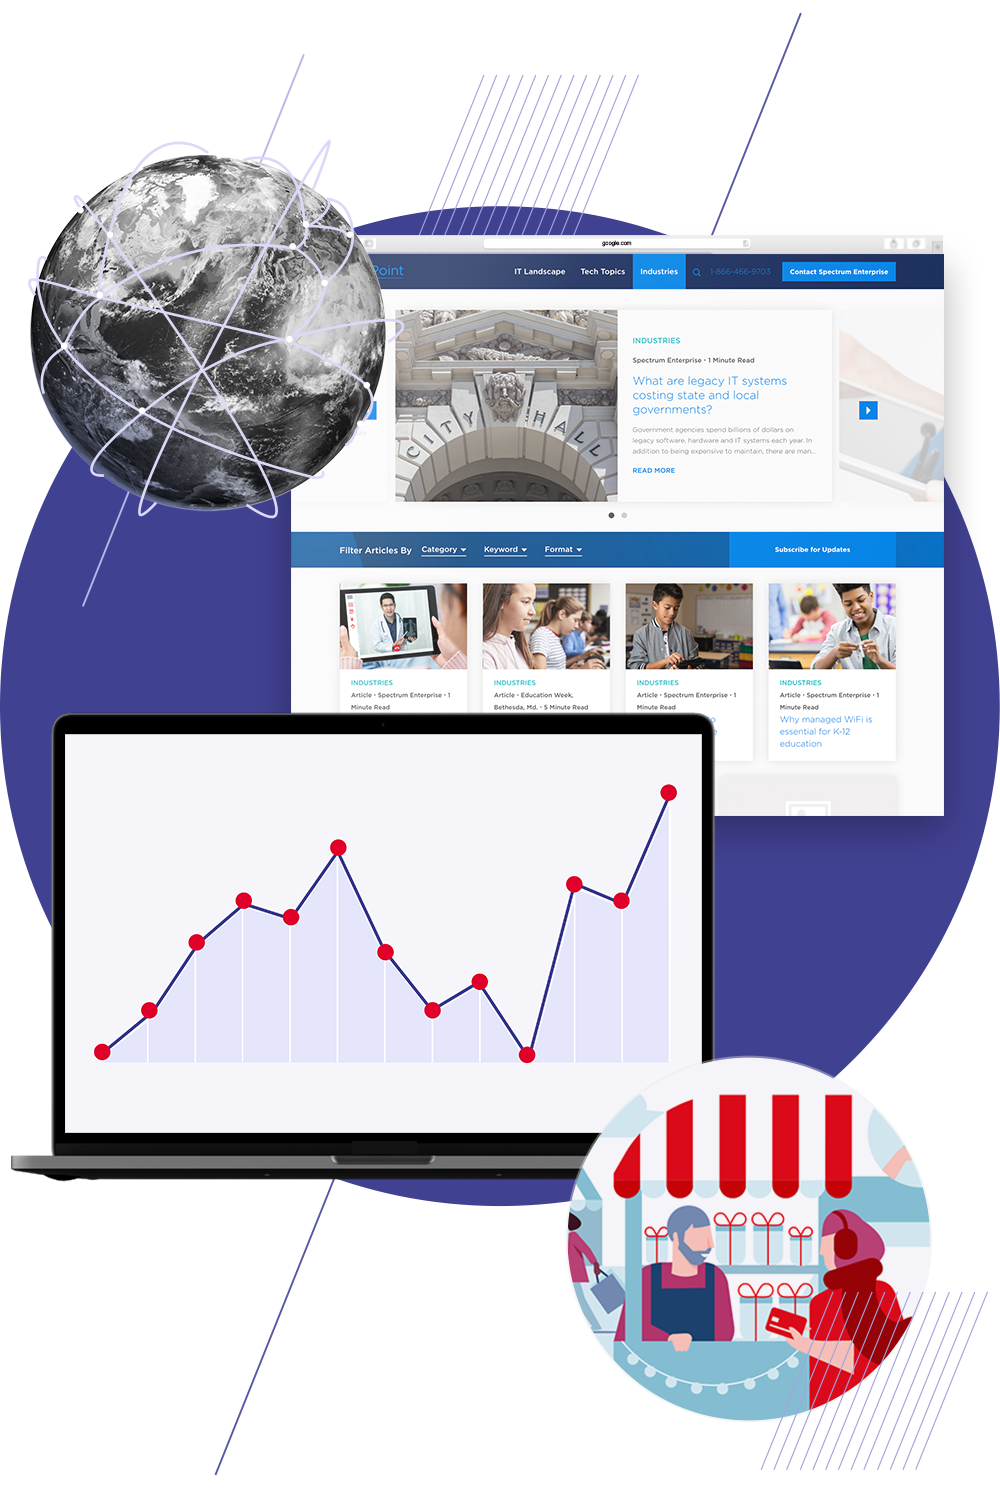 Content marketing programs